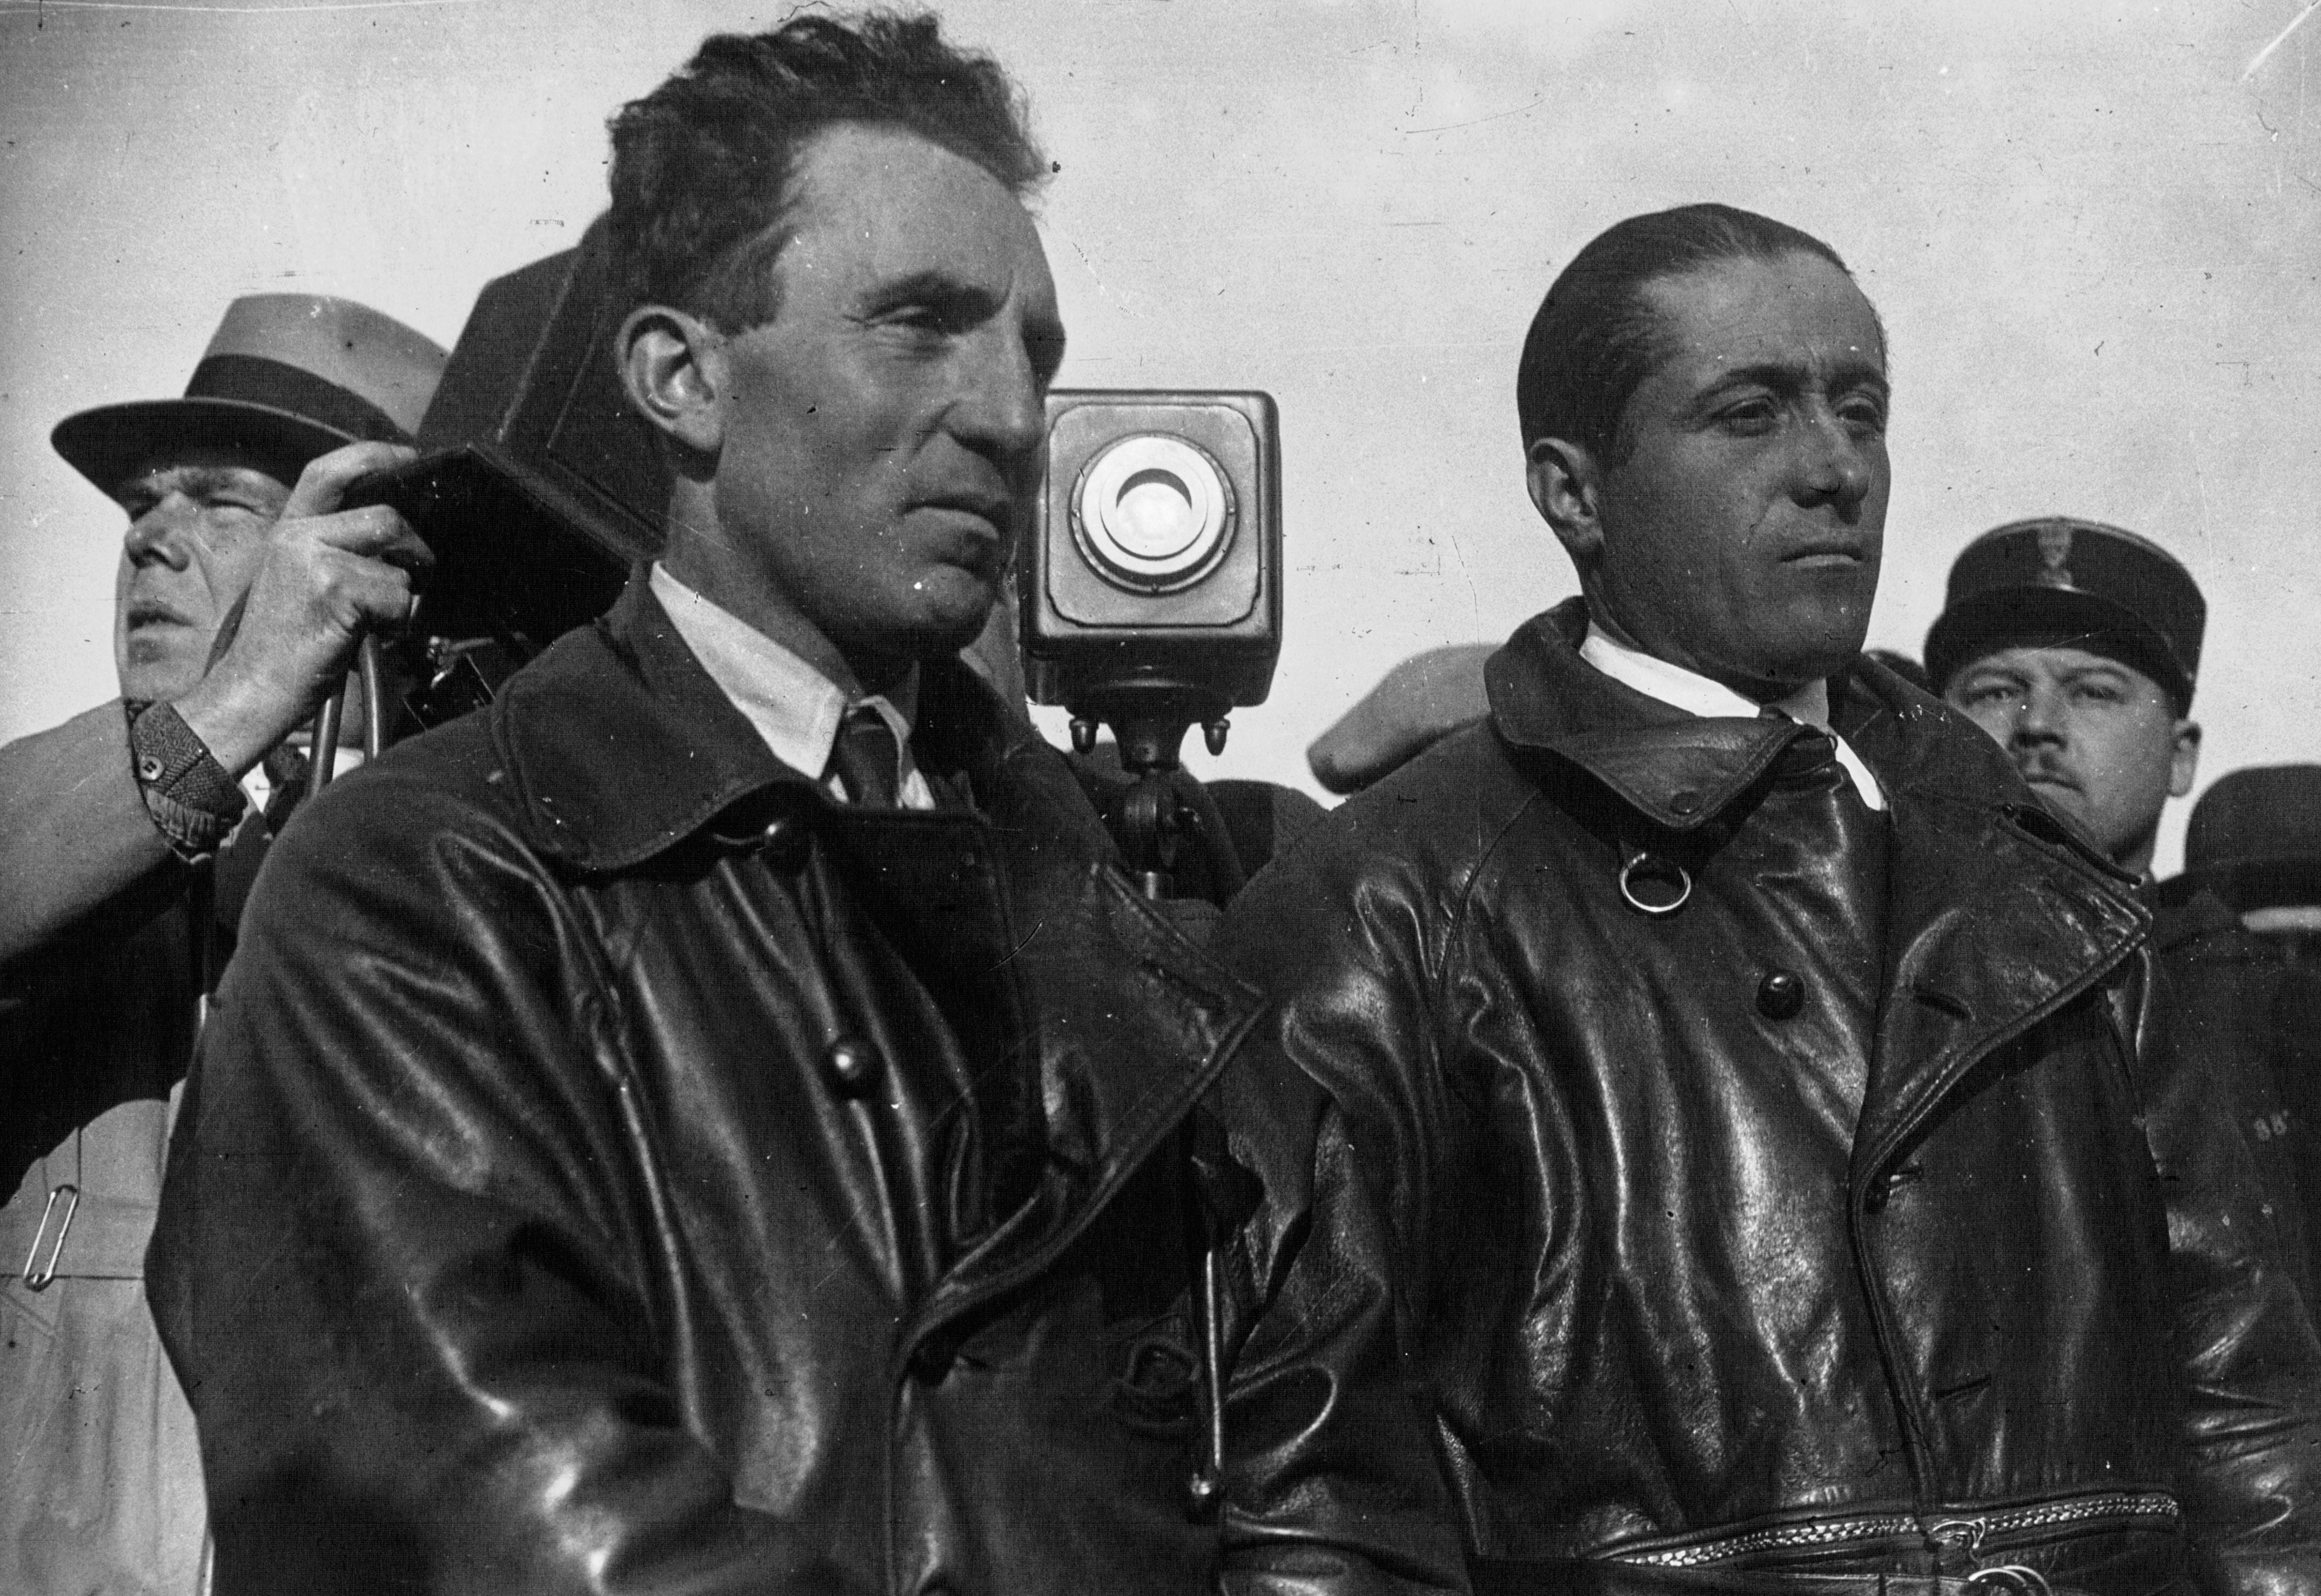 Maurice Bellonte, Dieudonn� Costes, 1929